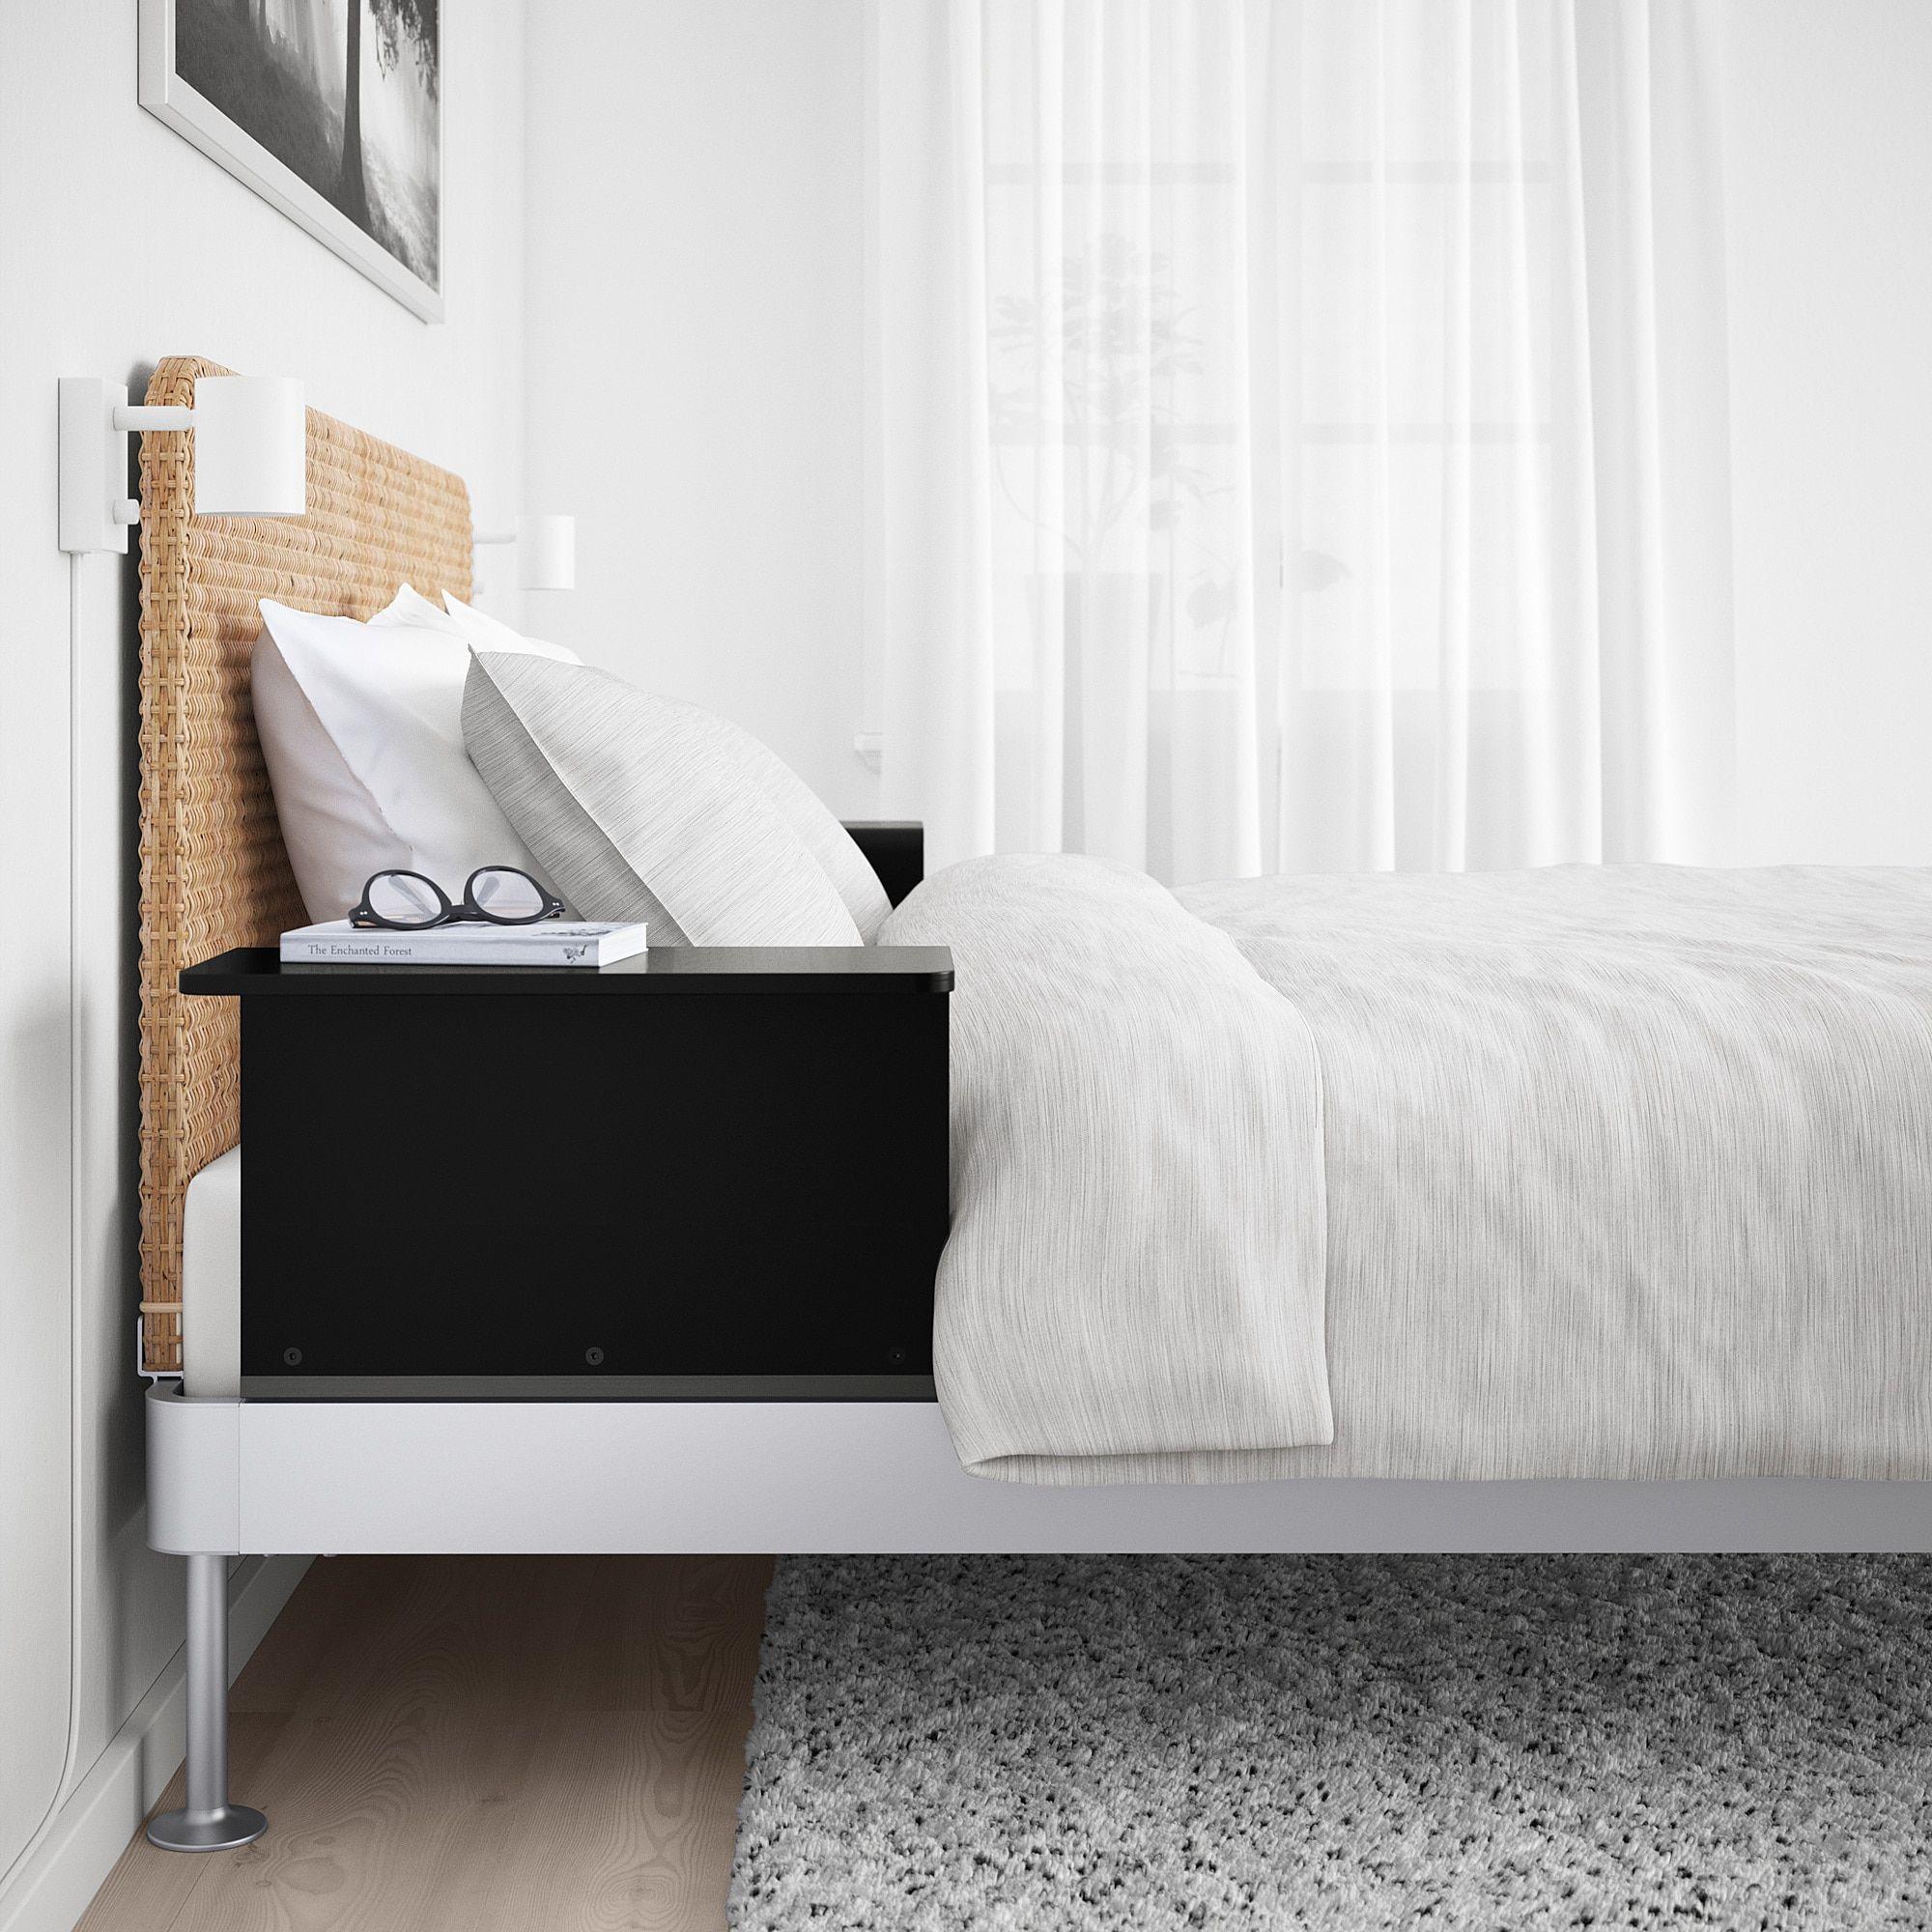 separation shoes 63a5b 3d93b IKEA DELAKTIG Aluminum, Rattan Bed frame/headboard/2 side ...